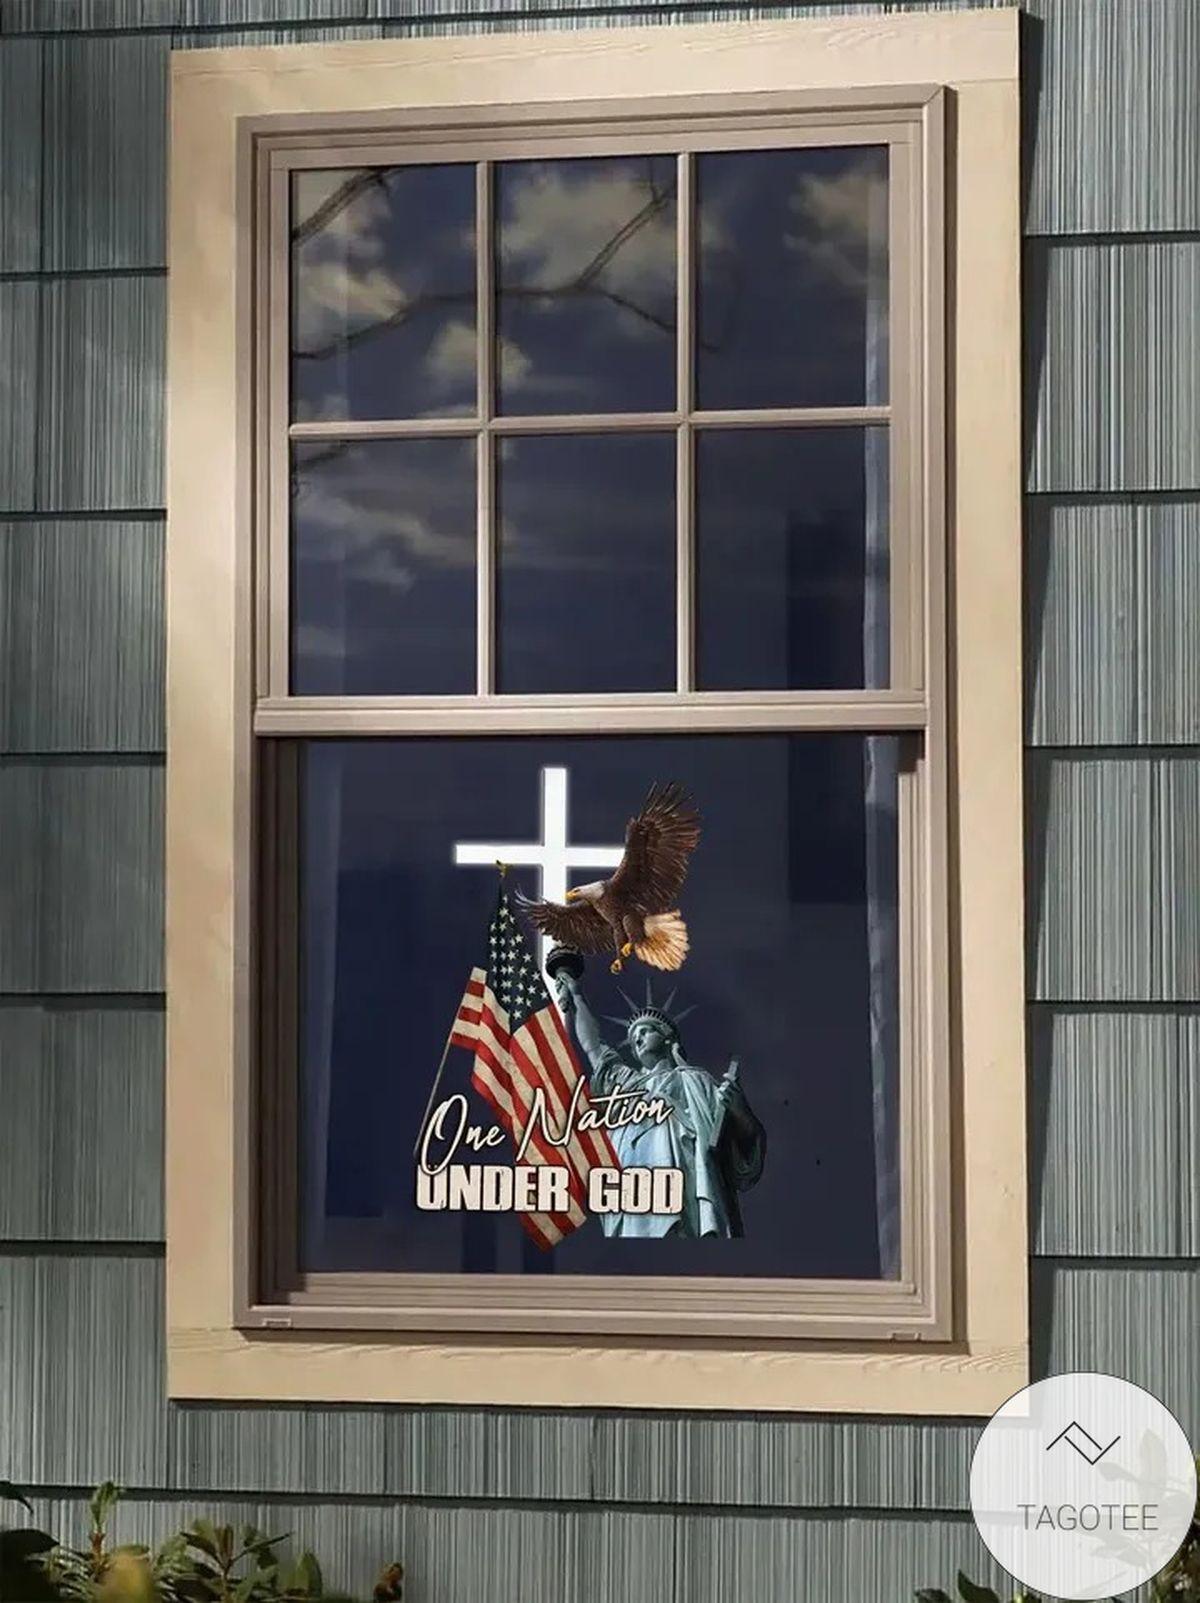 One Nation Under God Decalz